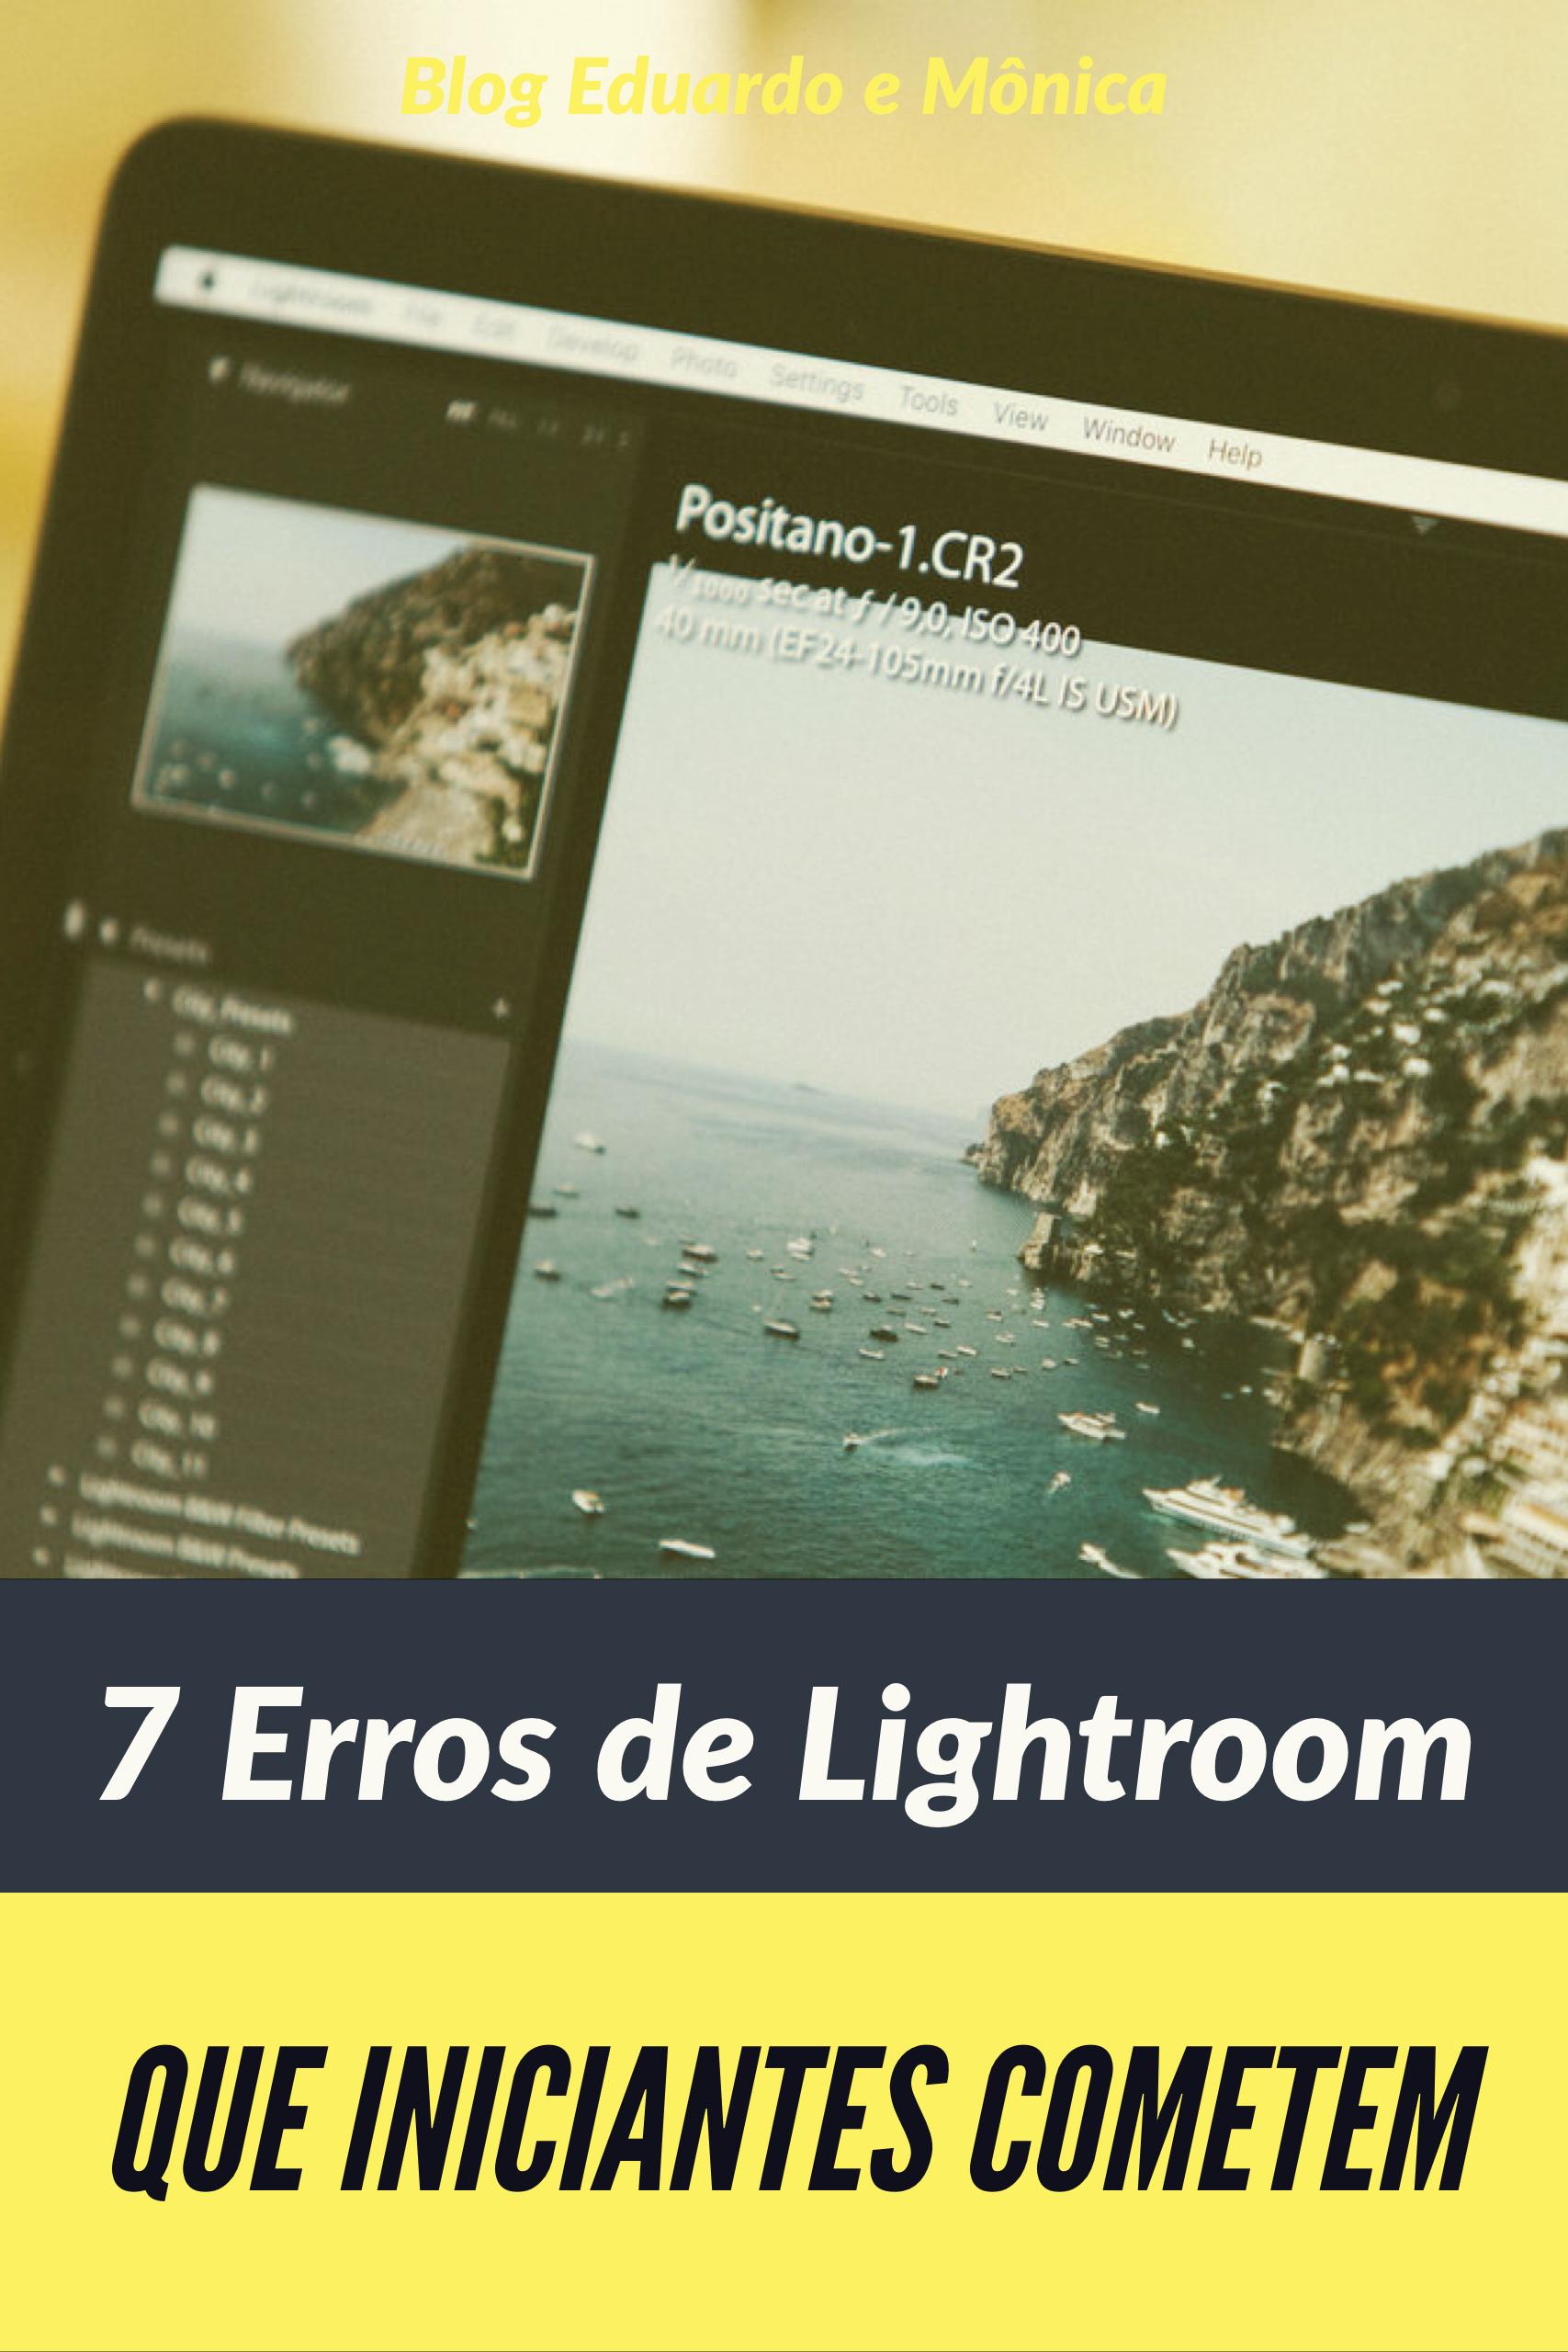 7 Erros que Iniciantes de Lightroom Cometem